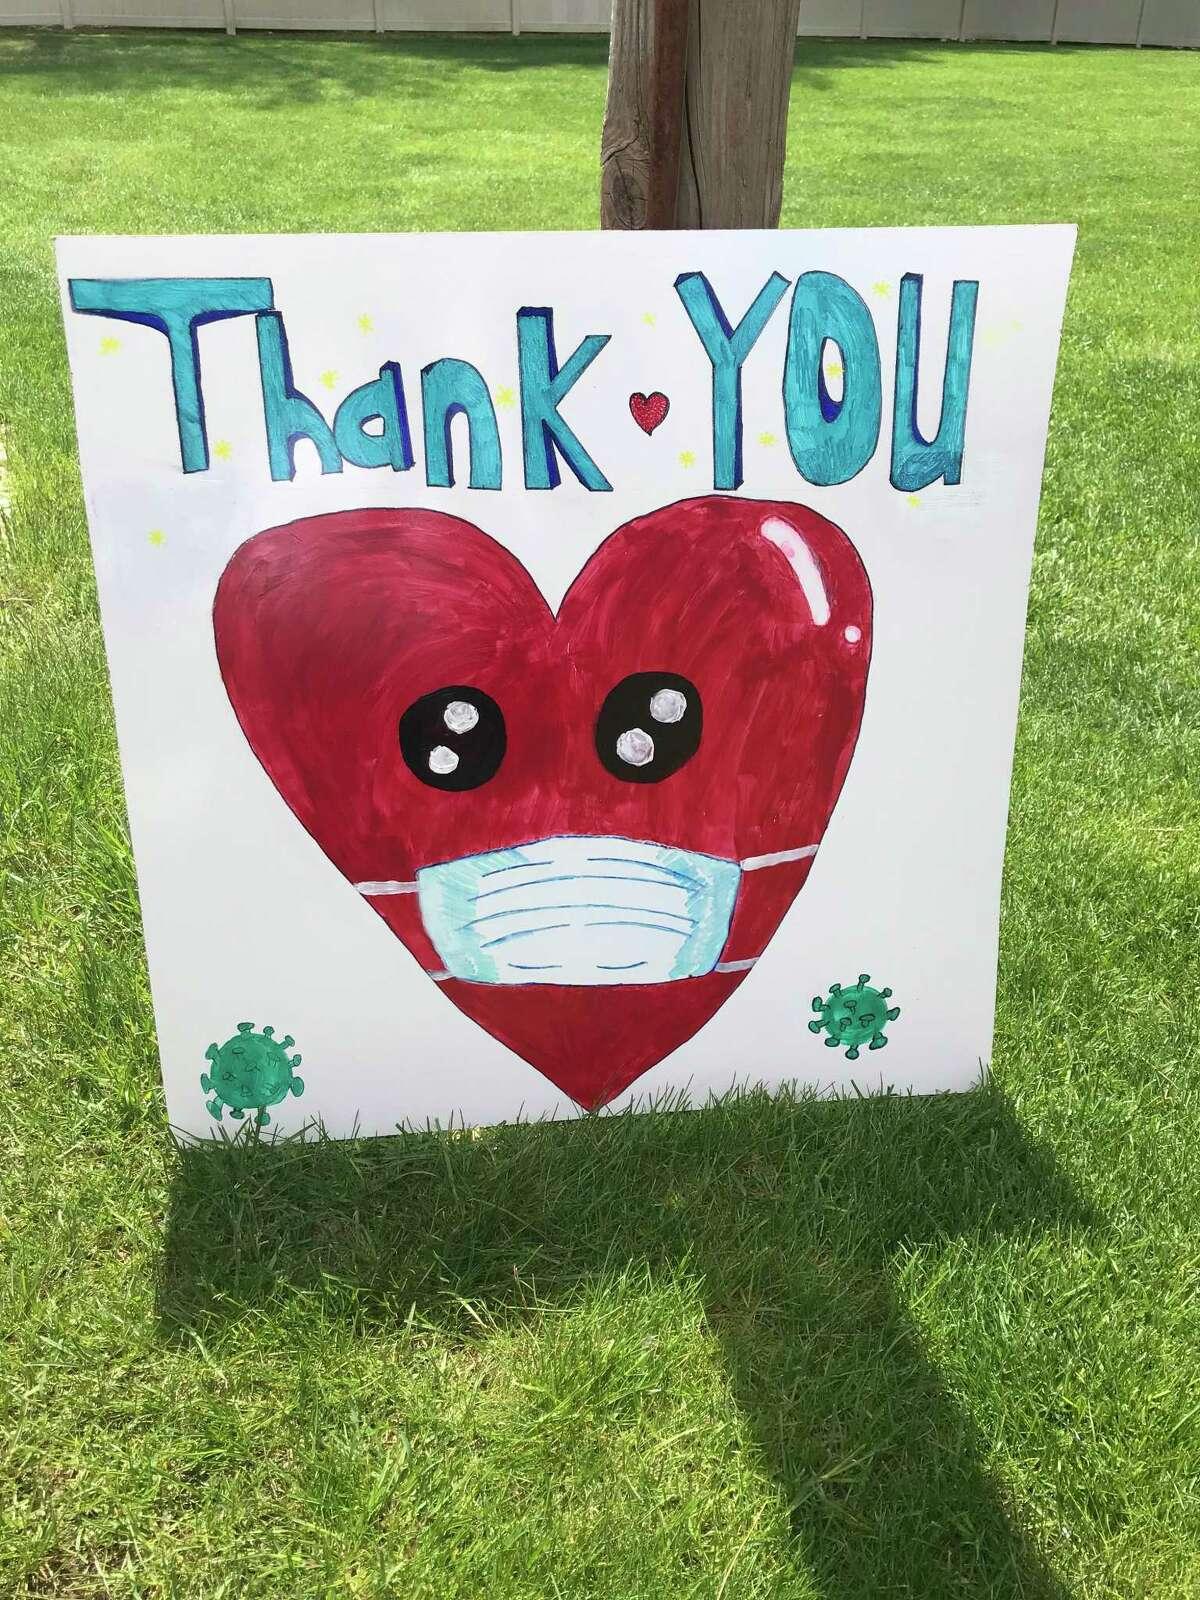 Shelton Intermediate School student Dimitri Mysirlidis created signs thanking essential workers.